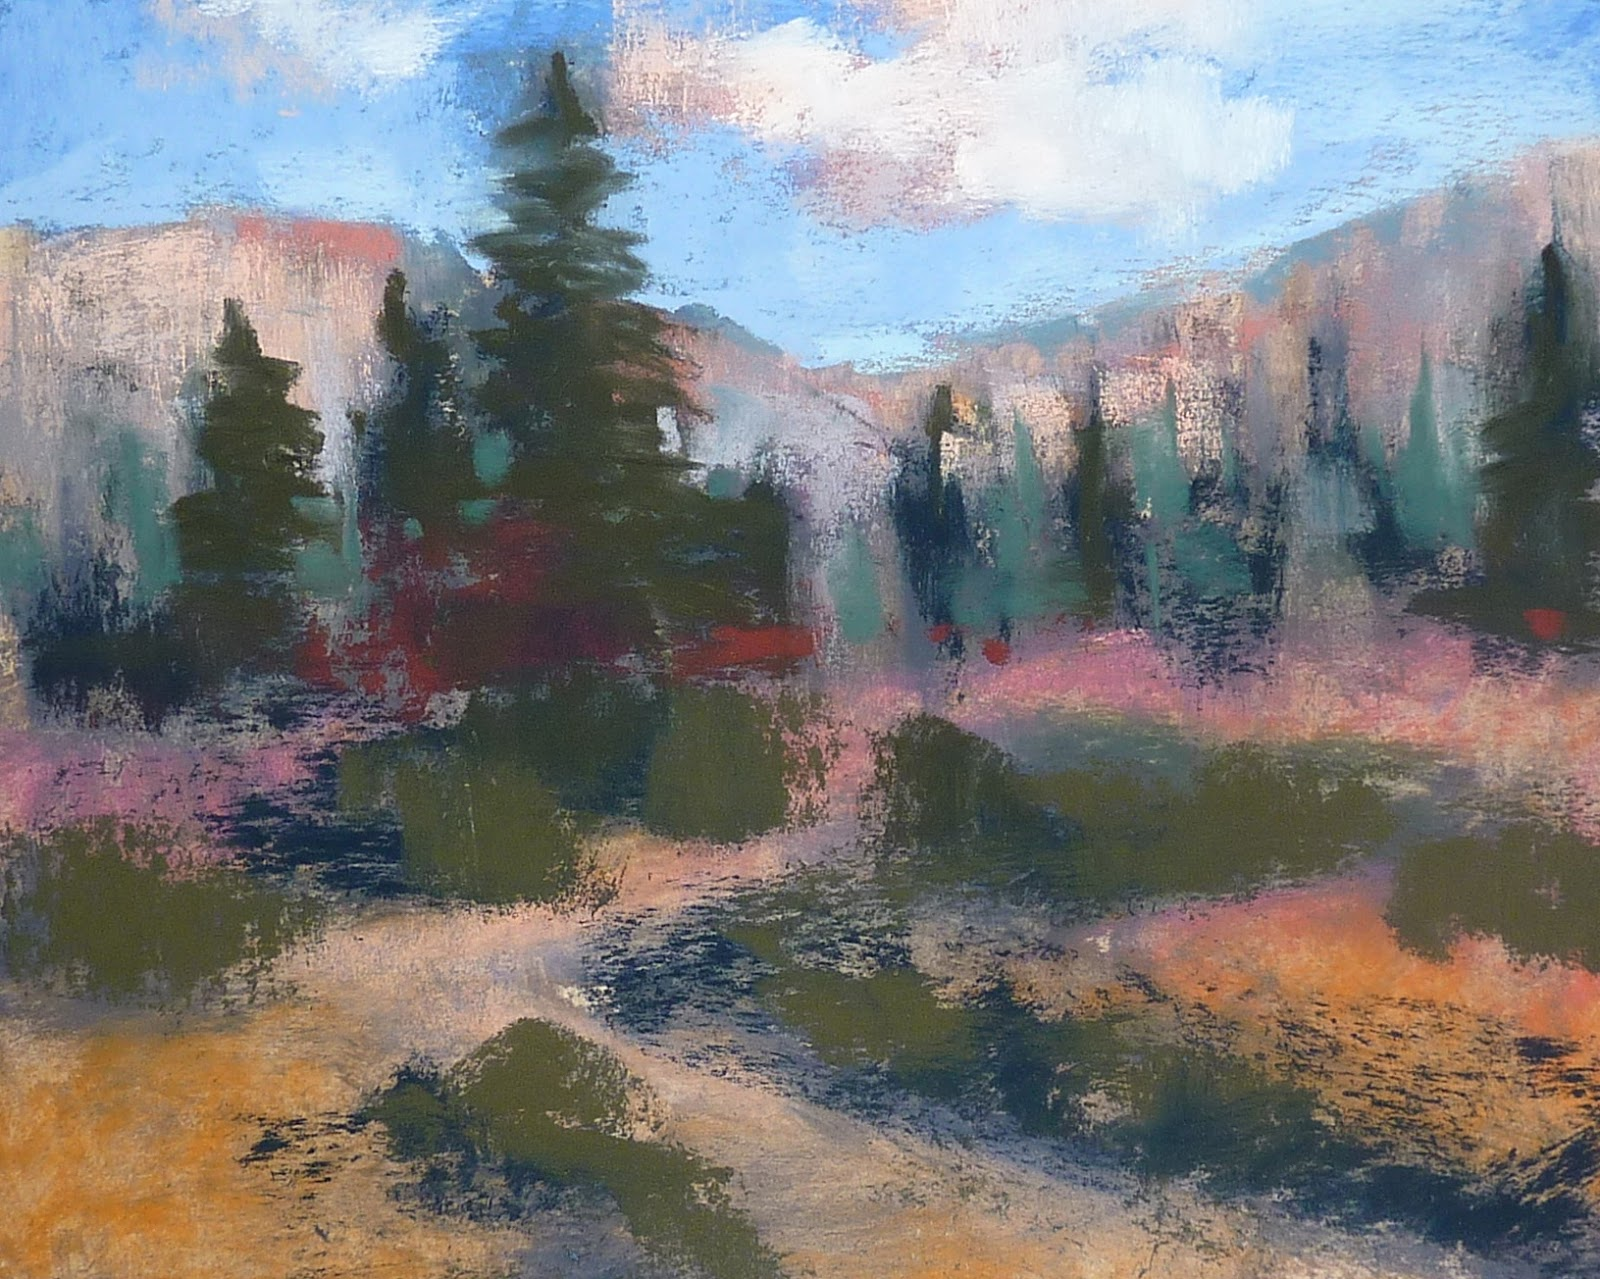 Pastel Landscape Demo Step by Step